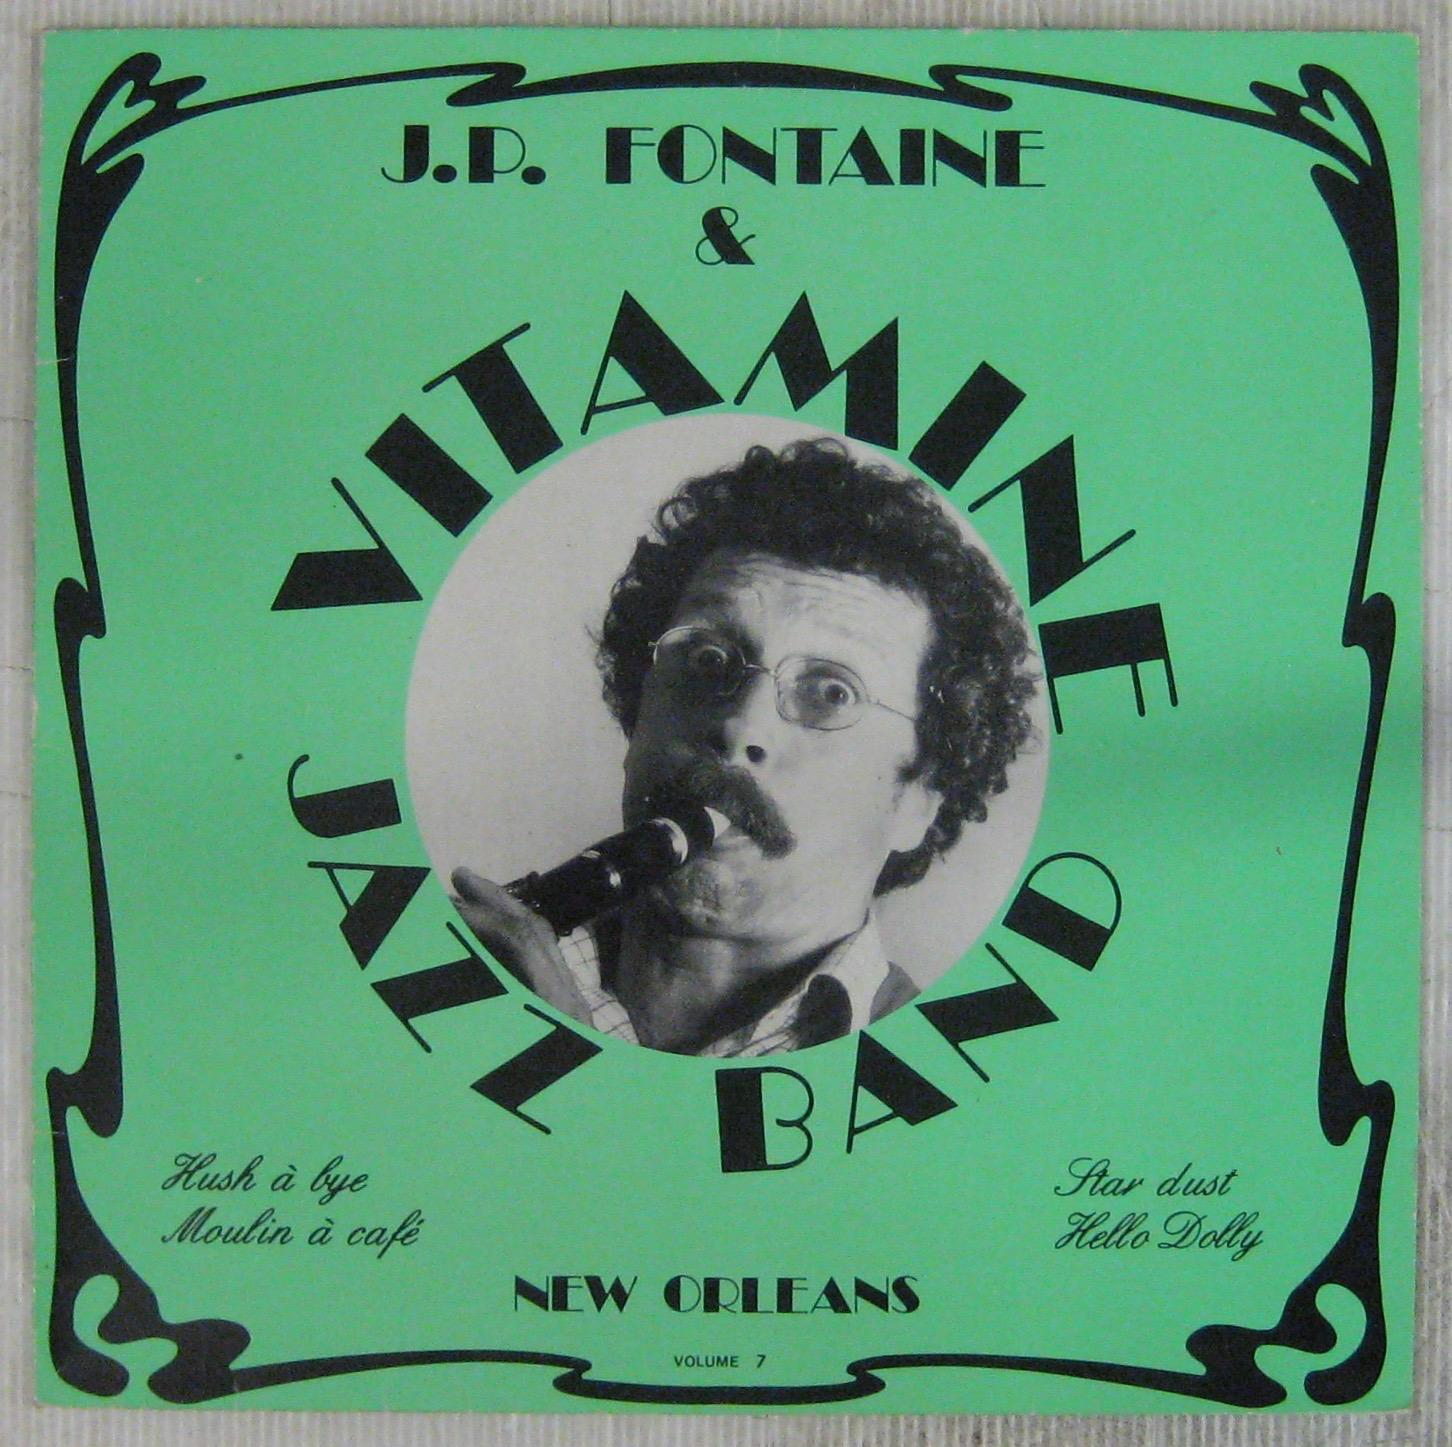 JEAN-PAUL FONTAINE ET VITAMINE JAZZ BAND - New Orleans Volume 7 - LP